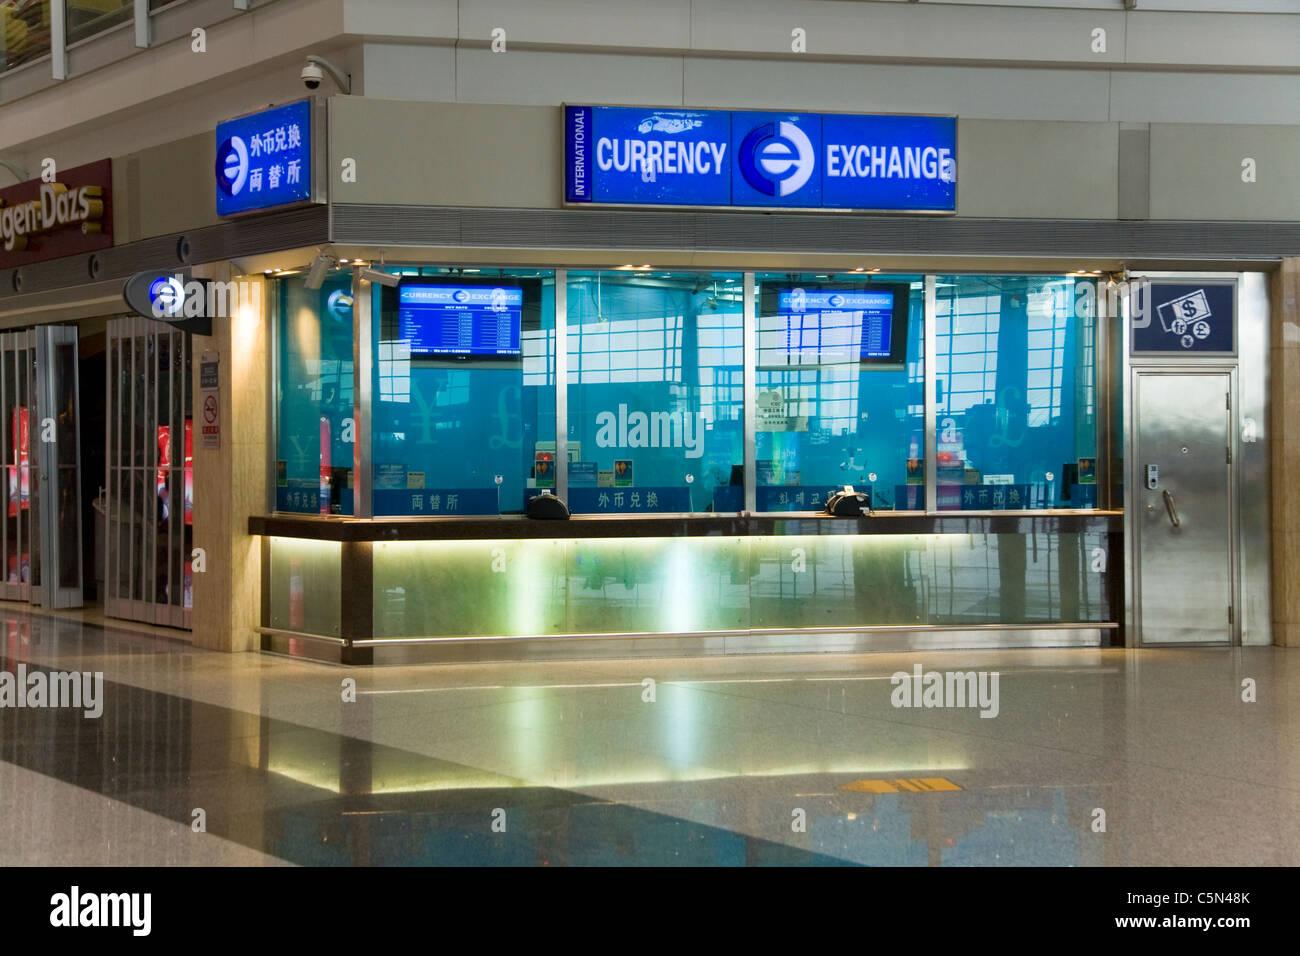 Bureau de change office operated by international currency exchange